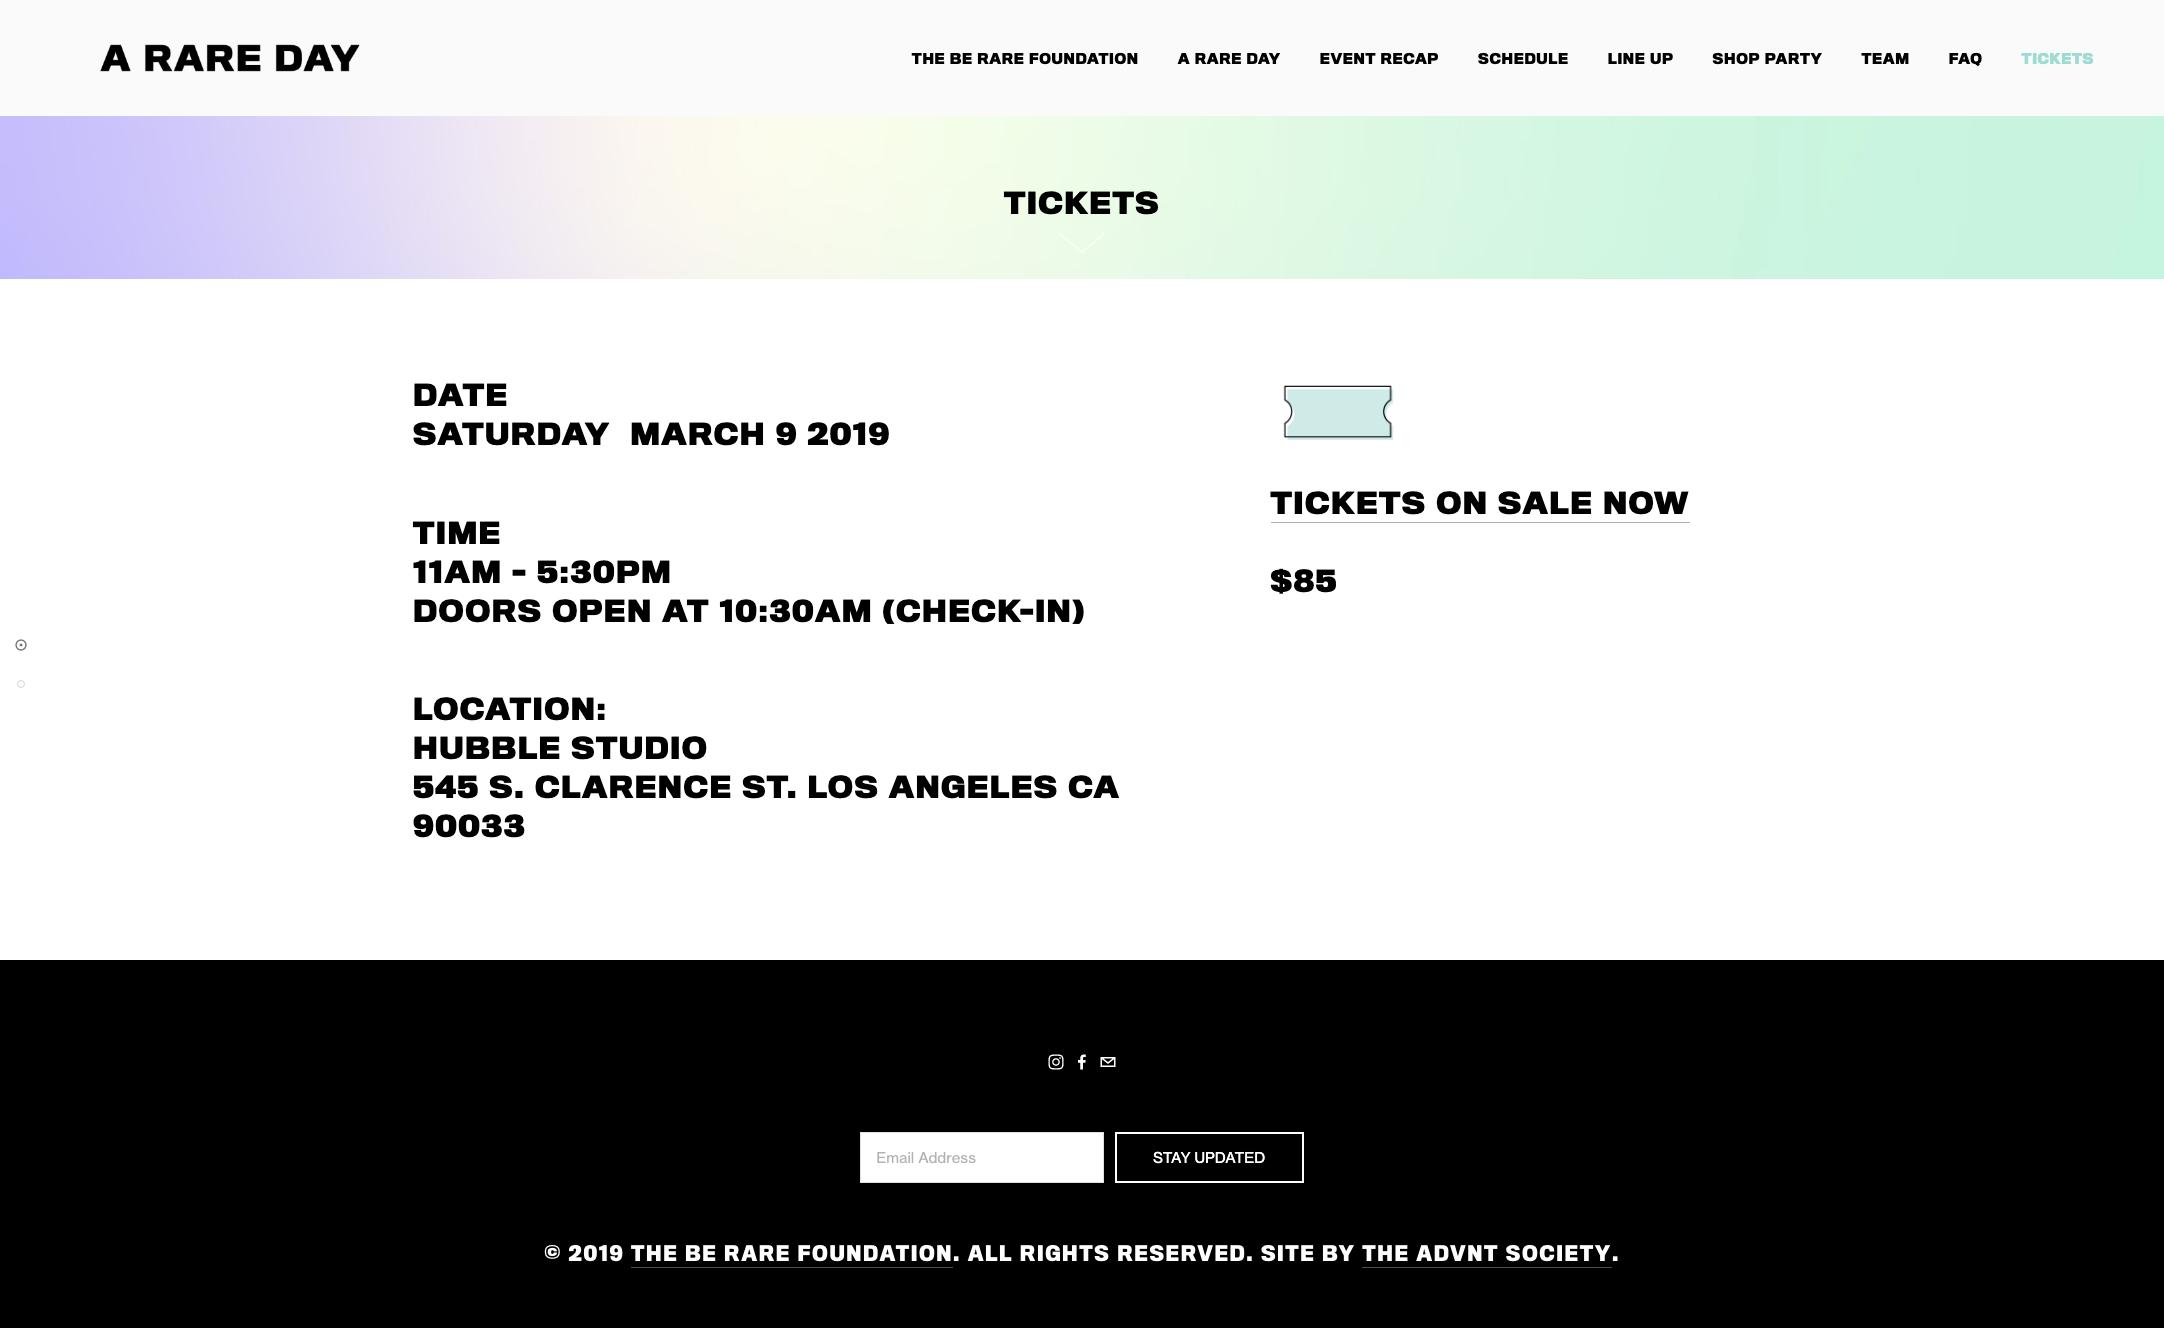 screencapture-arareday-tickets-2019-06-27-01_59_00.png